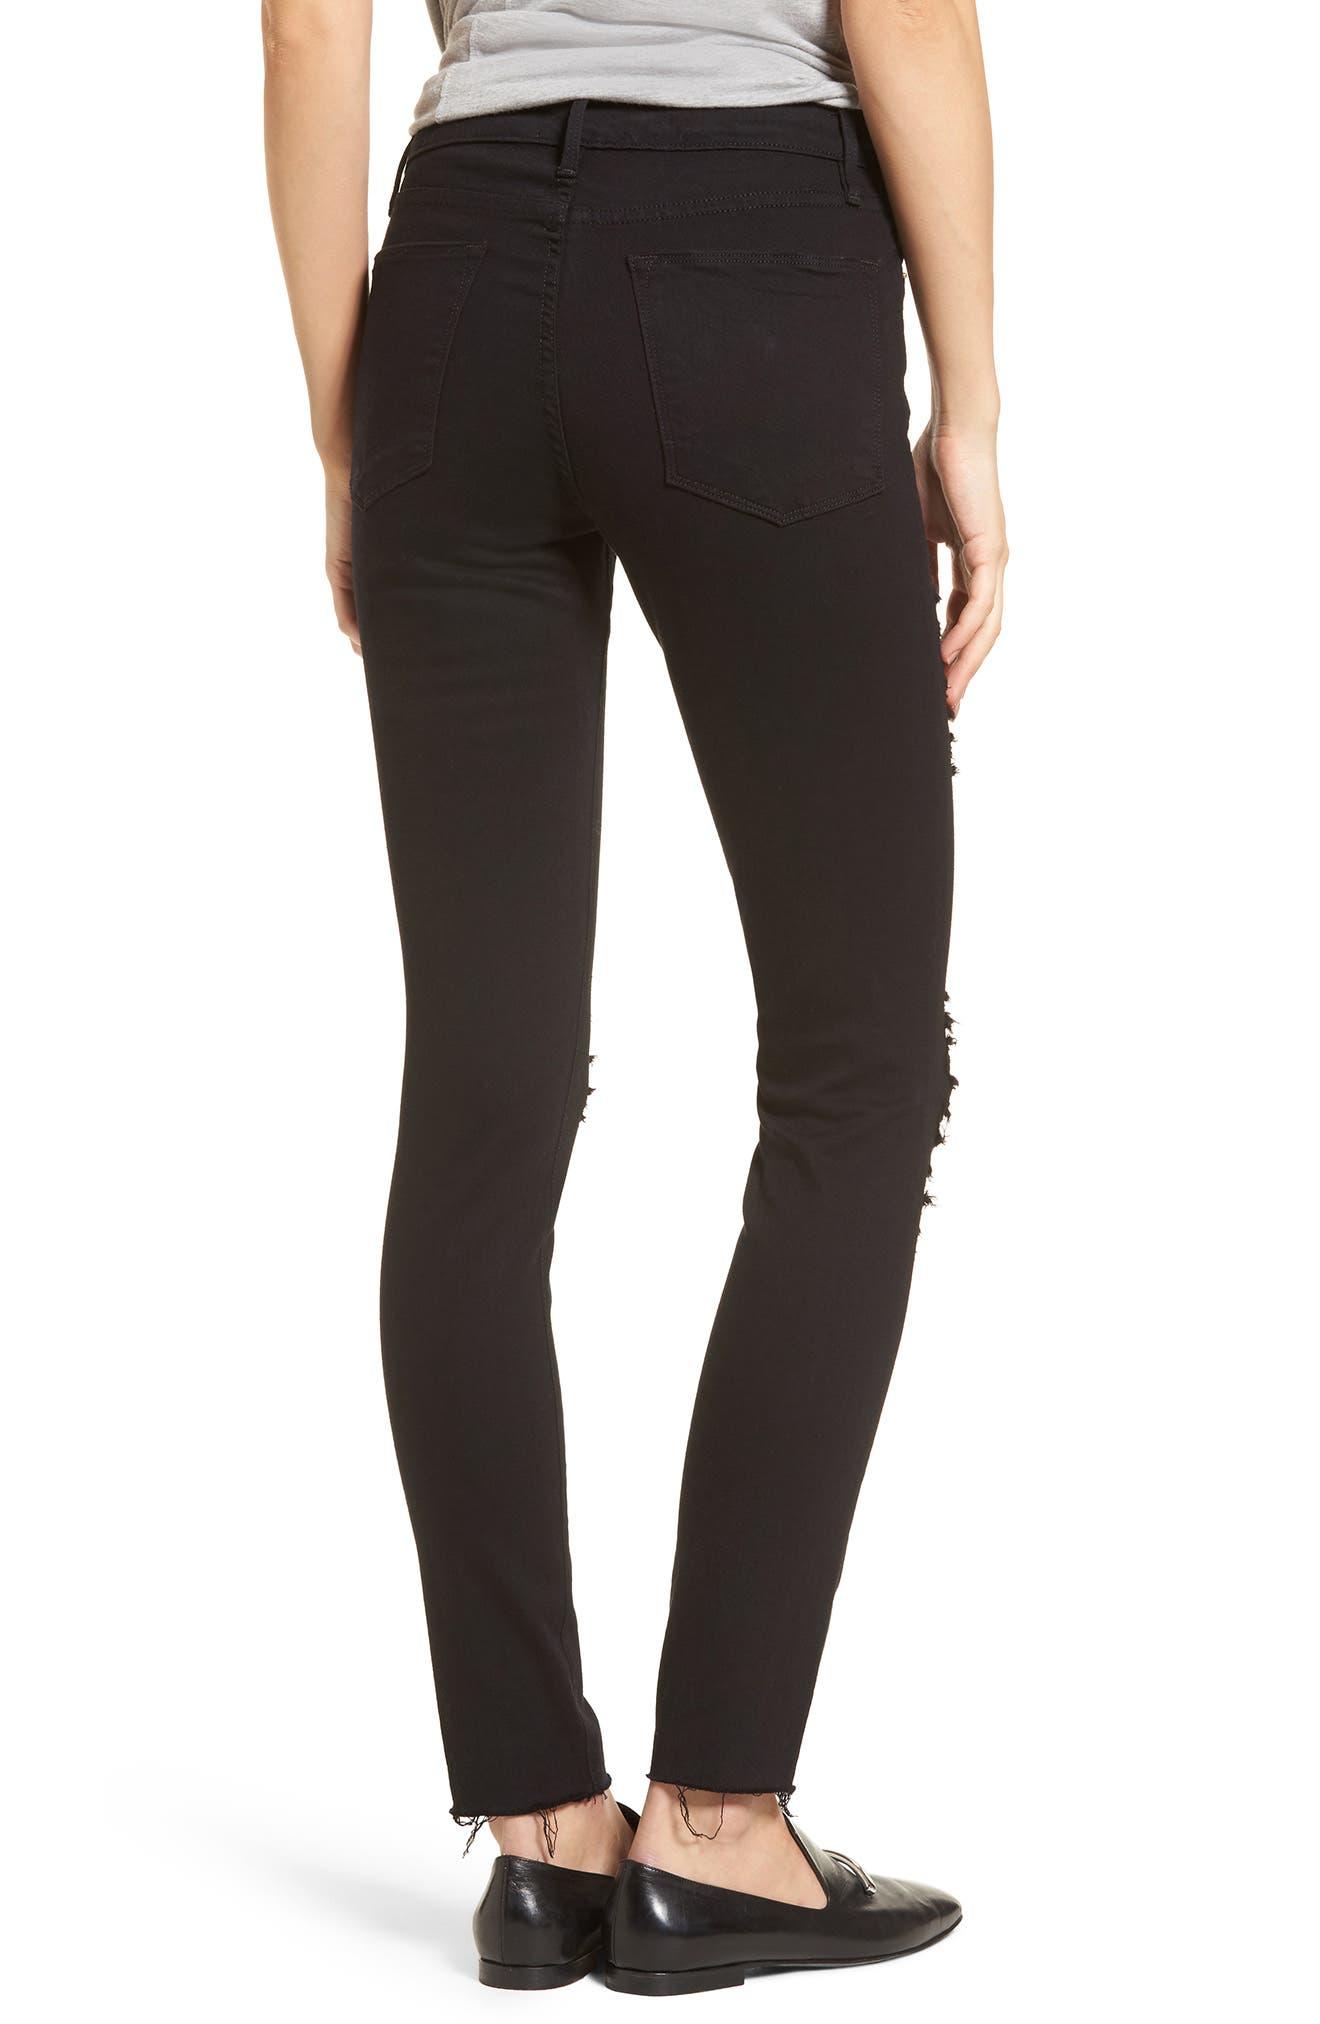 Le Color High Waist Skinny Jeans,                             Alternate thumbnail 2, color,                             003